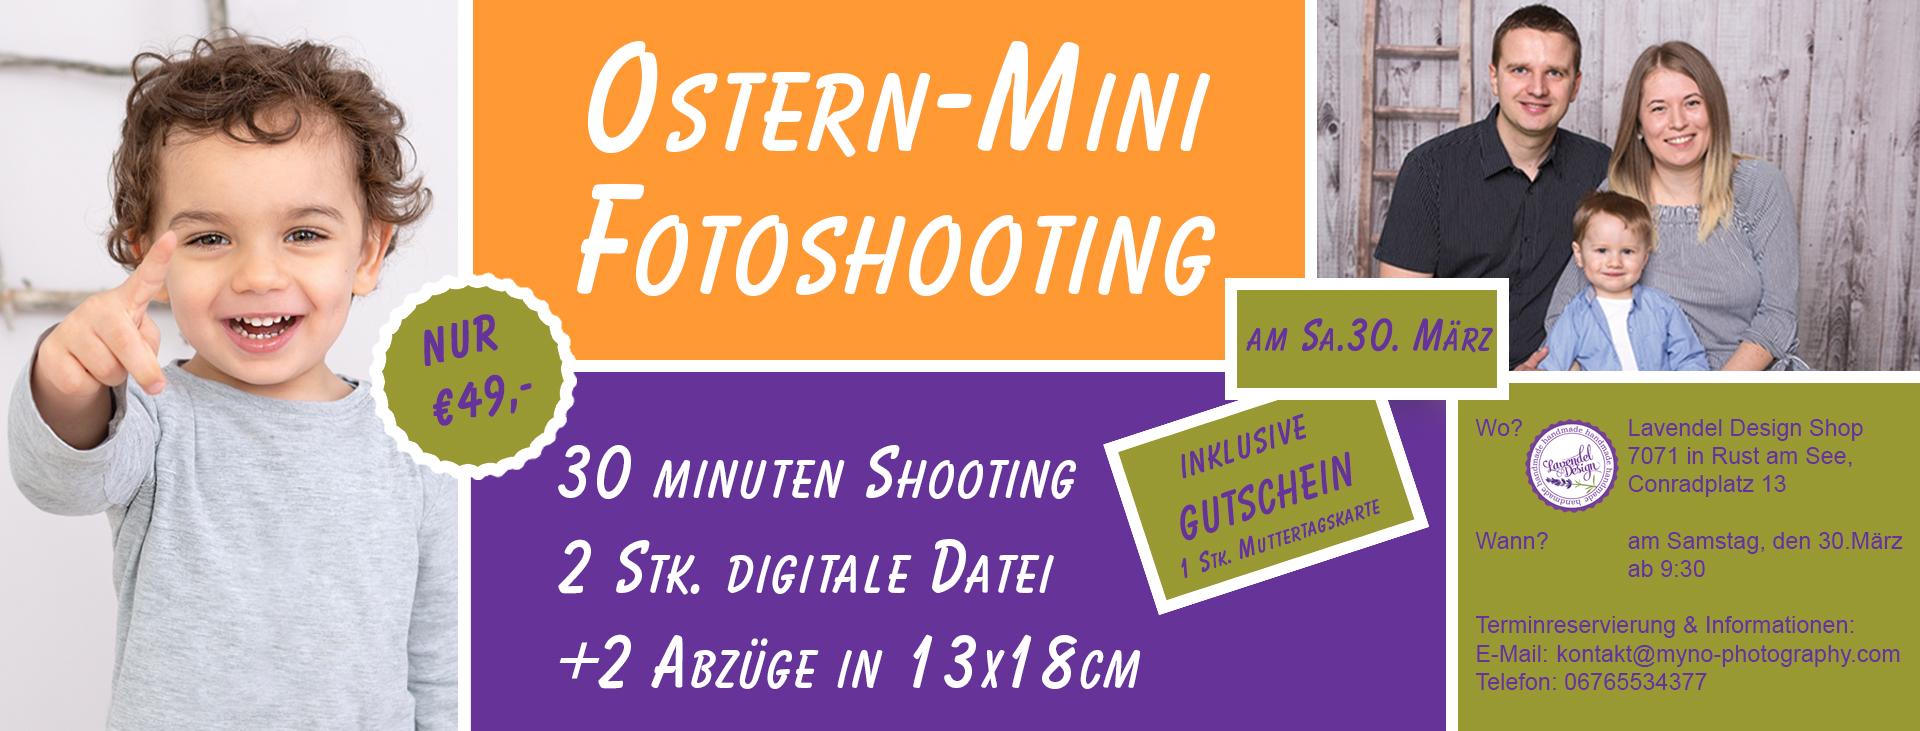 Ostern-Mini Fotoshooting